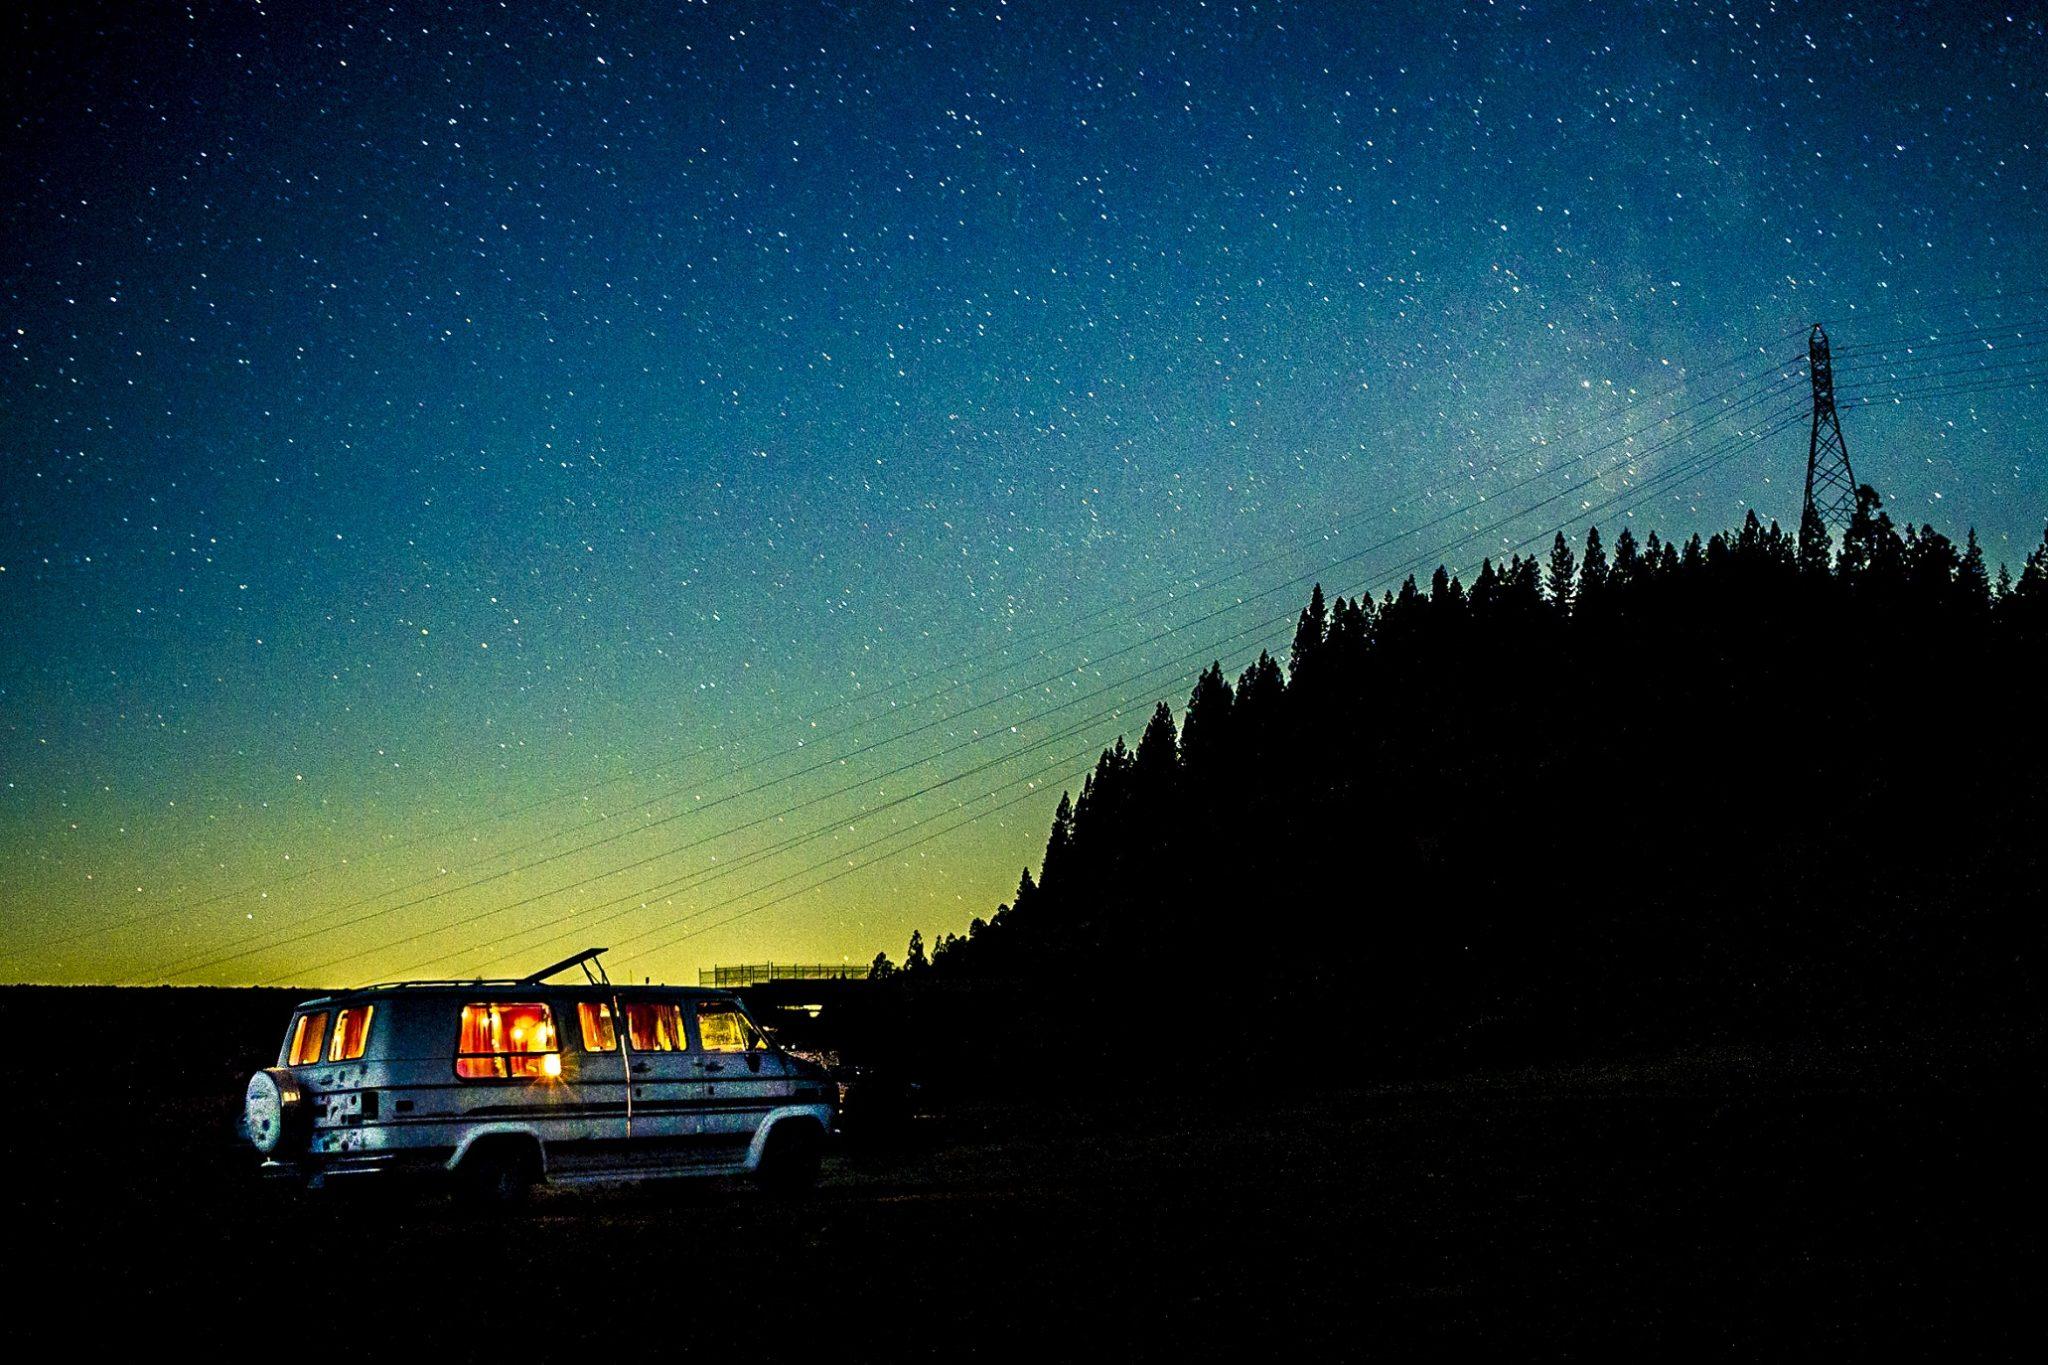 Van under the stars